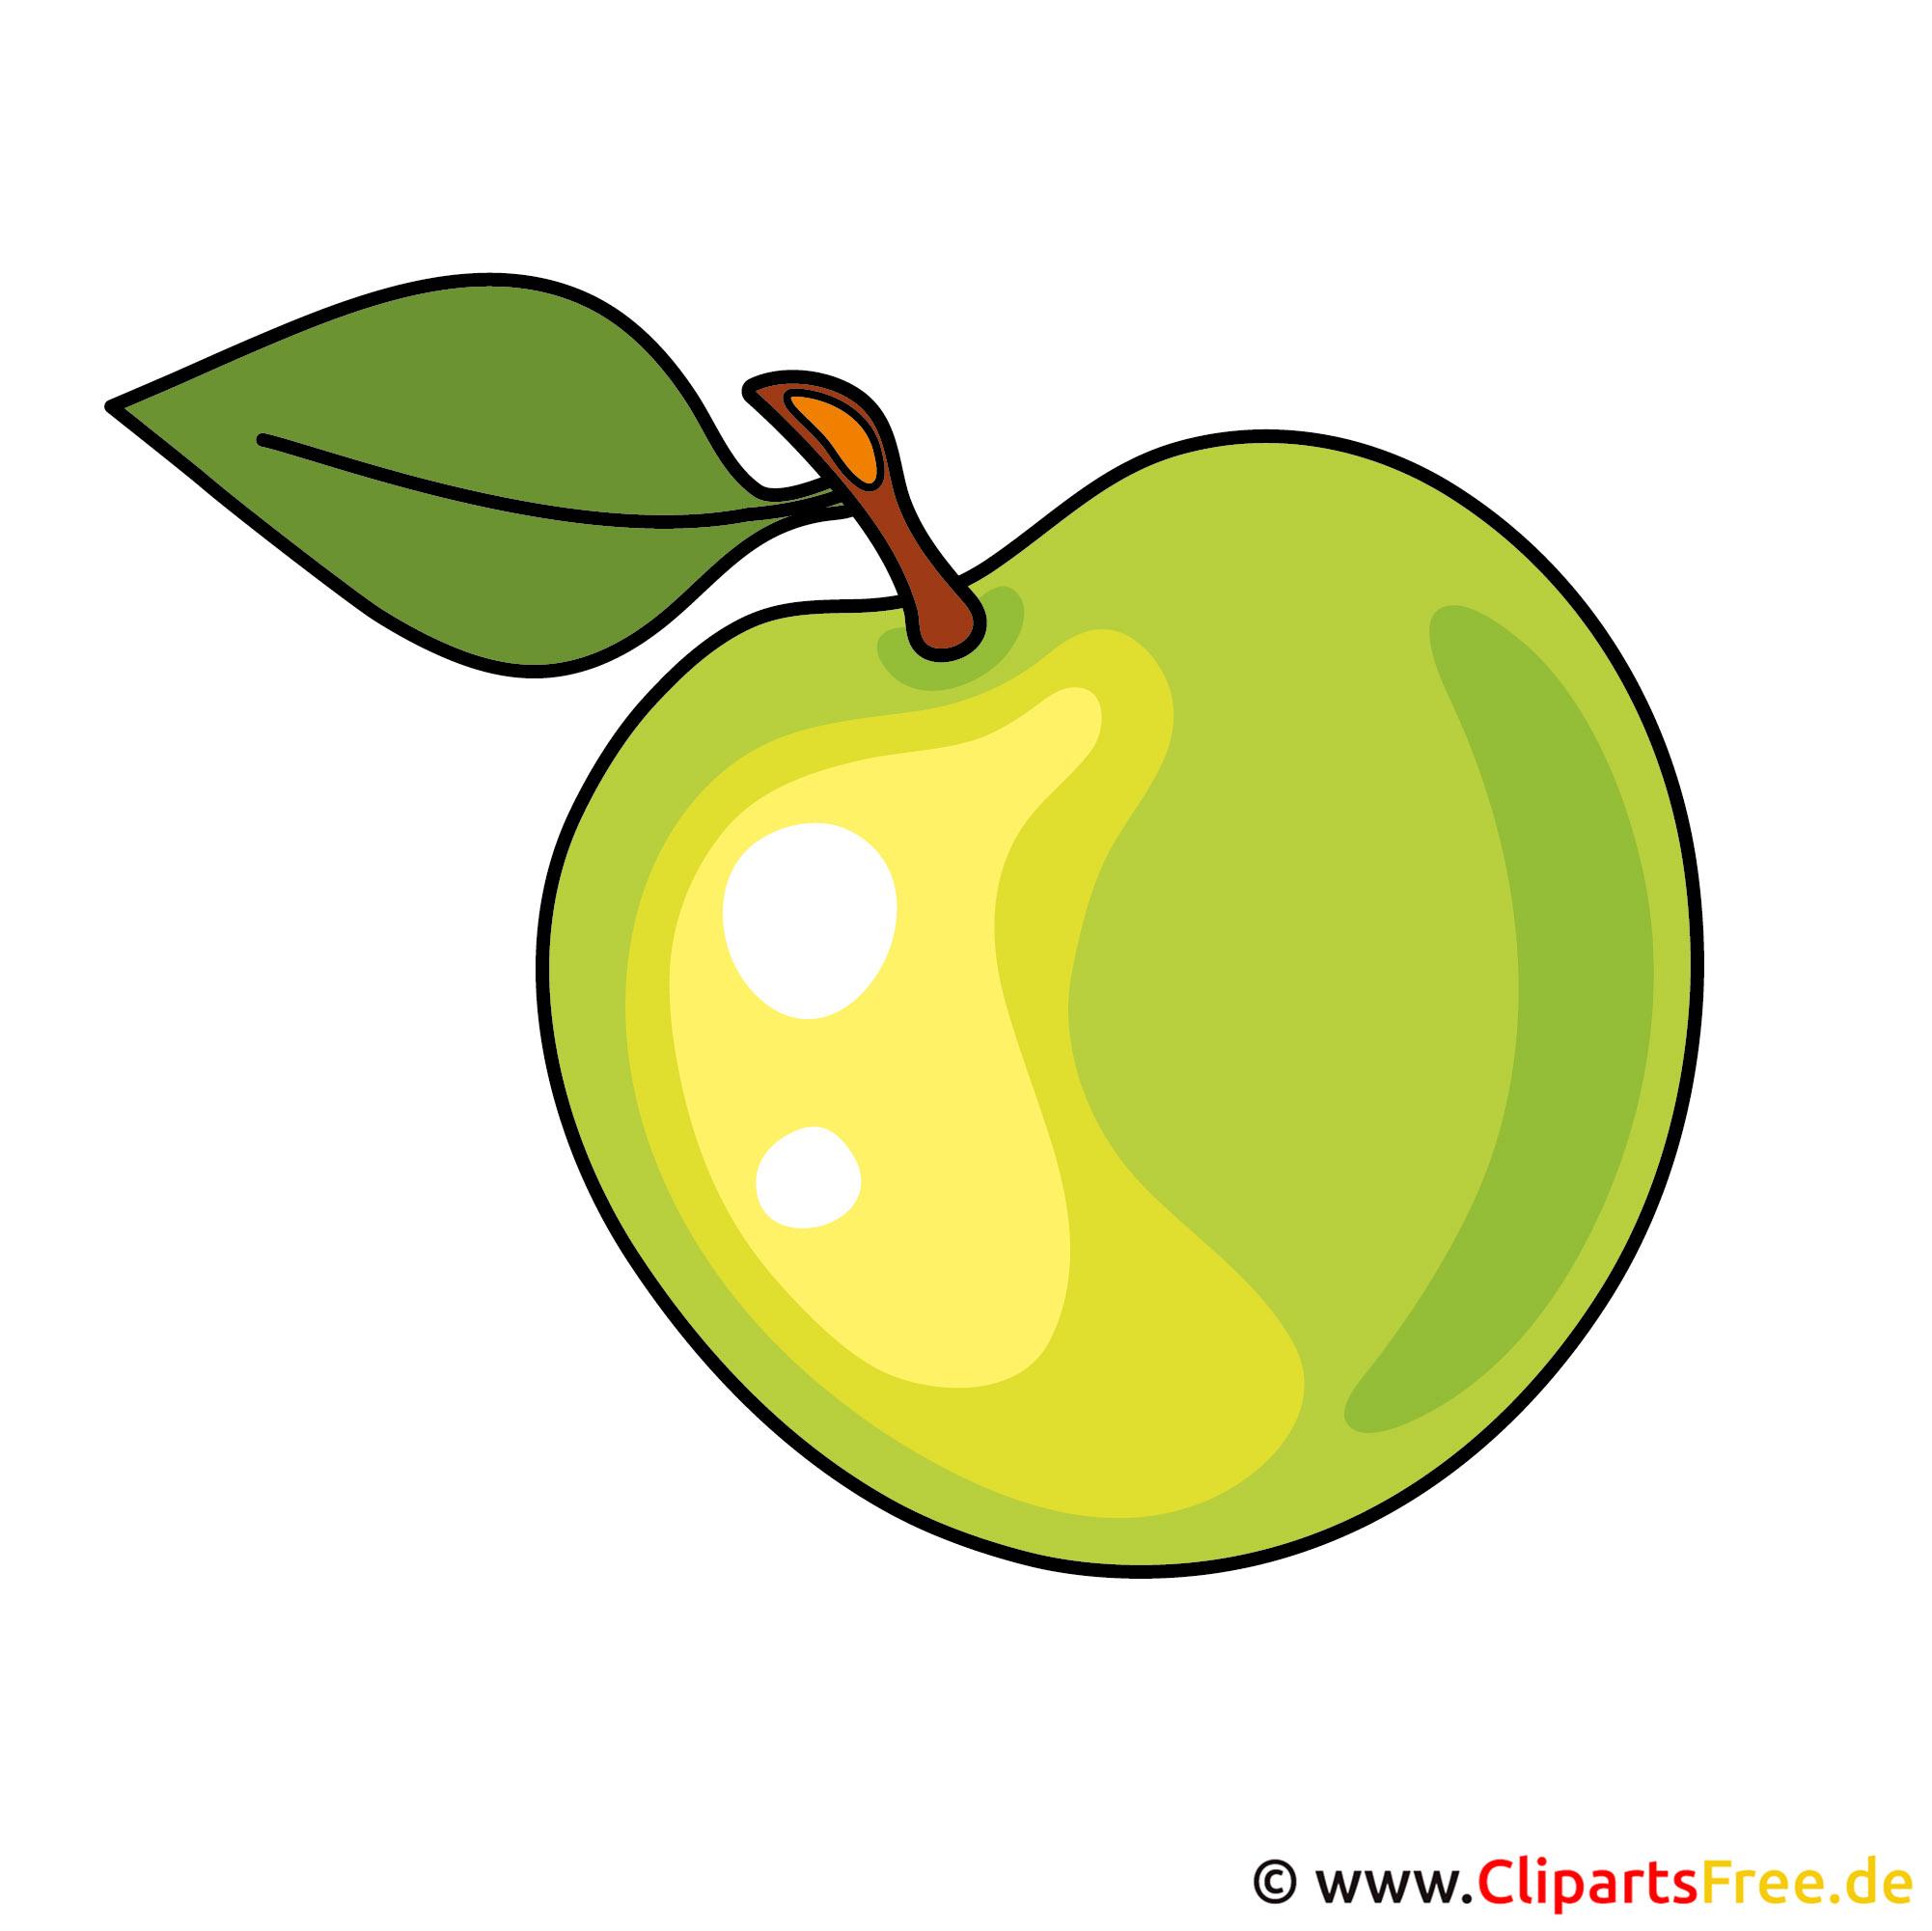 Grüner Apfel Bild, Clipart, Grafik